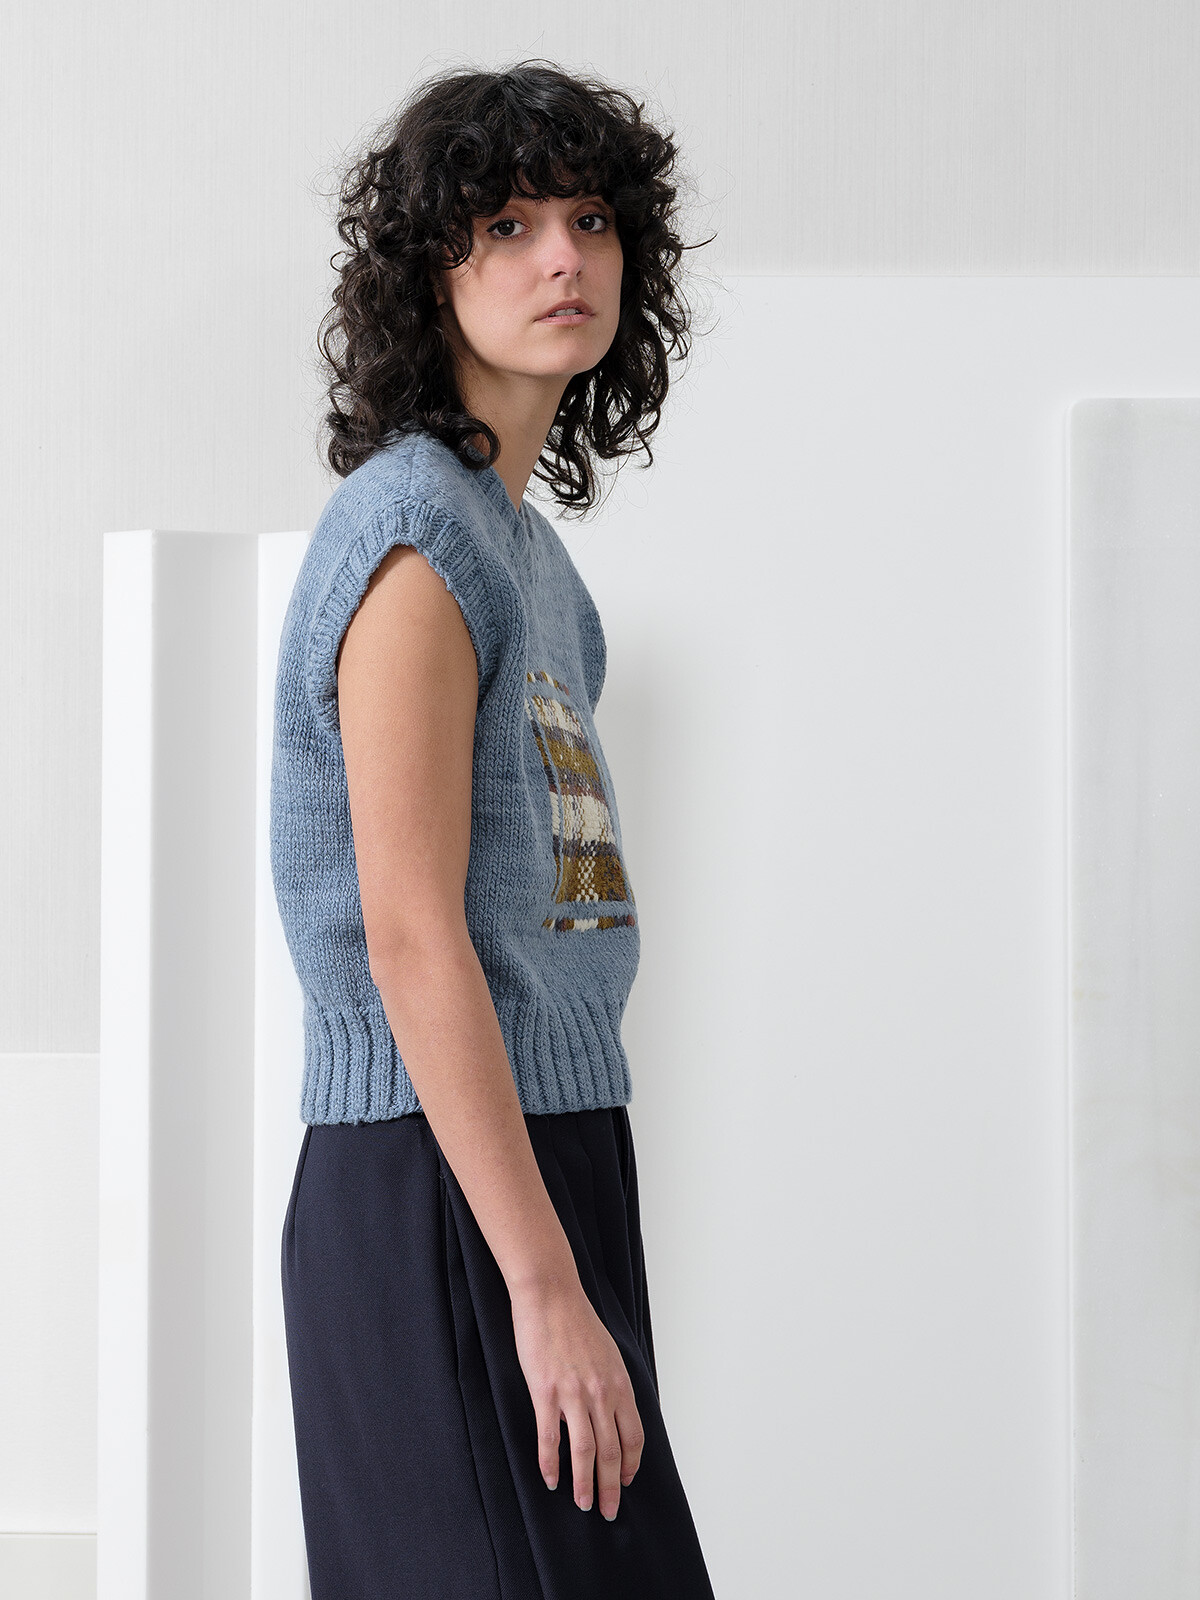 Mending vest Image